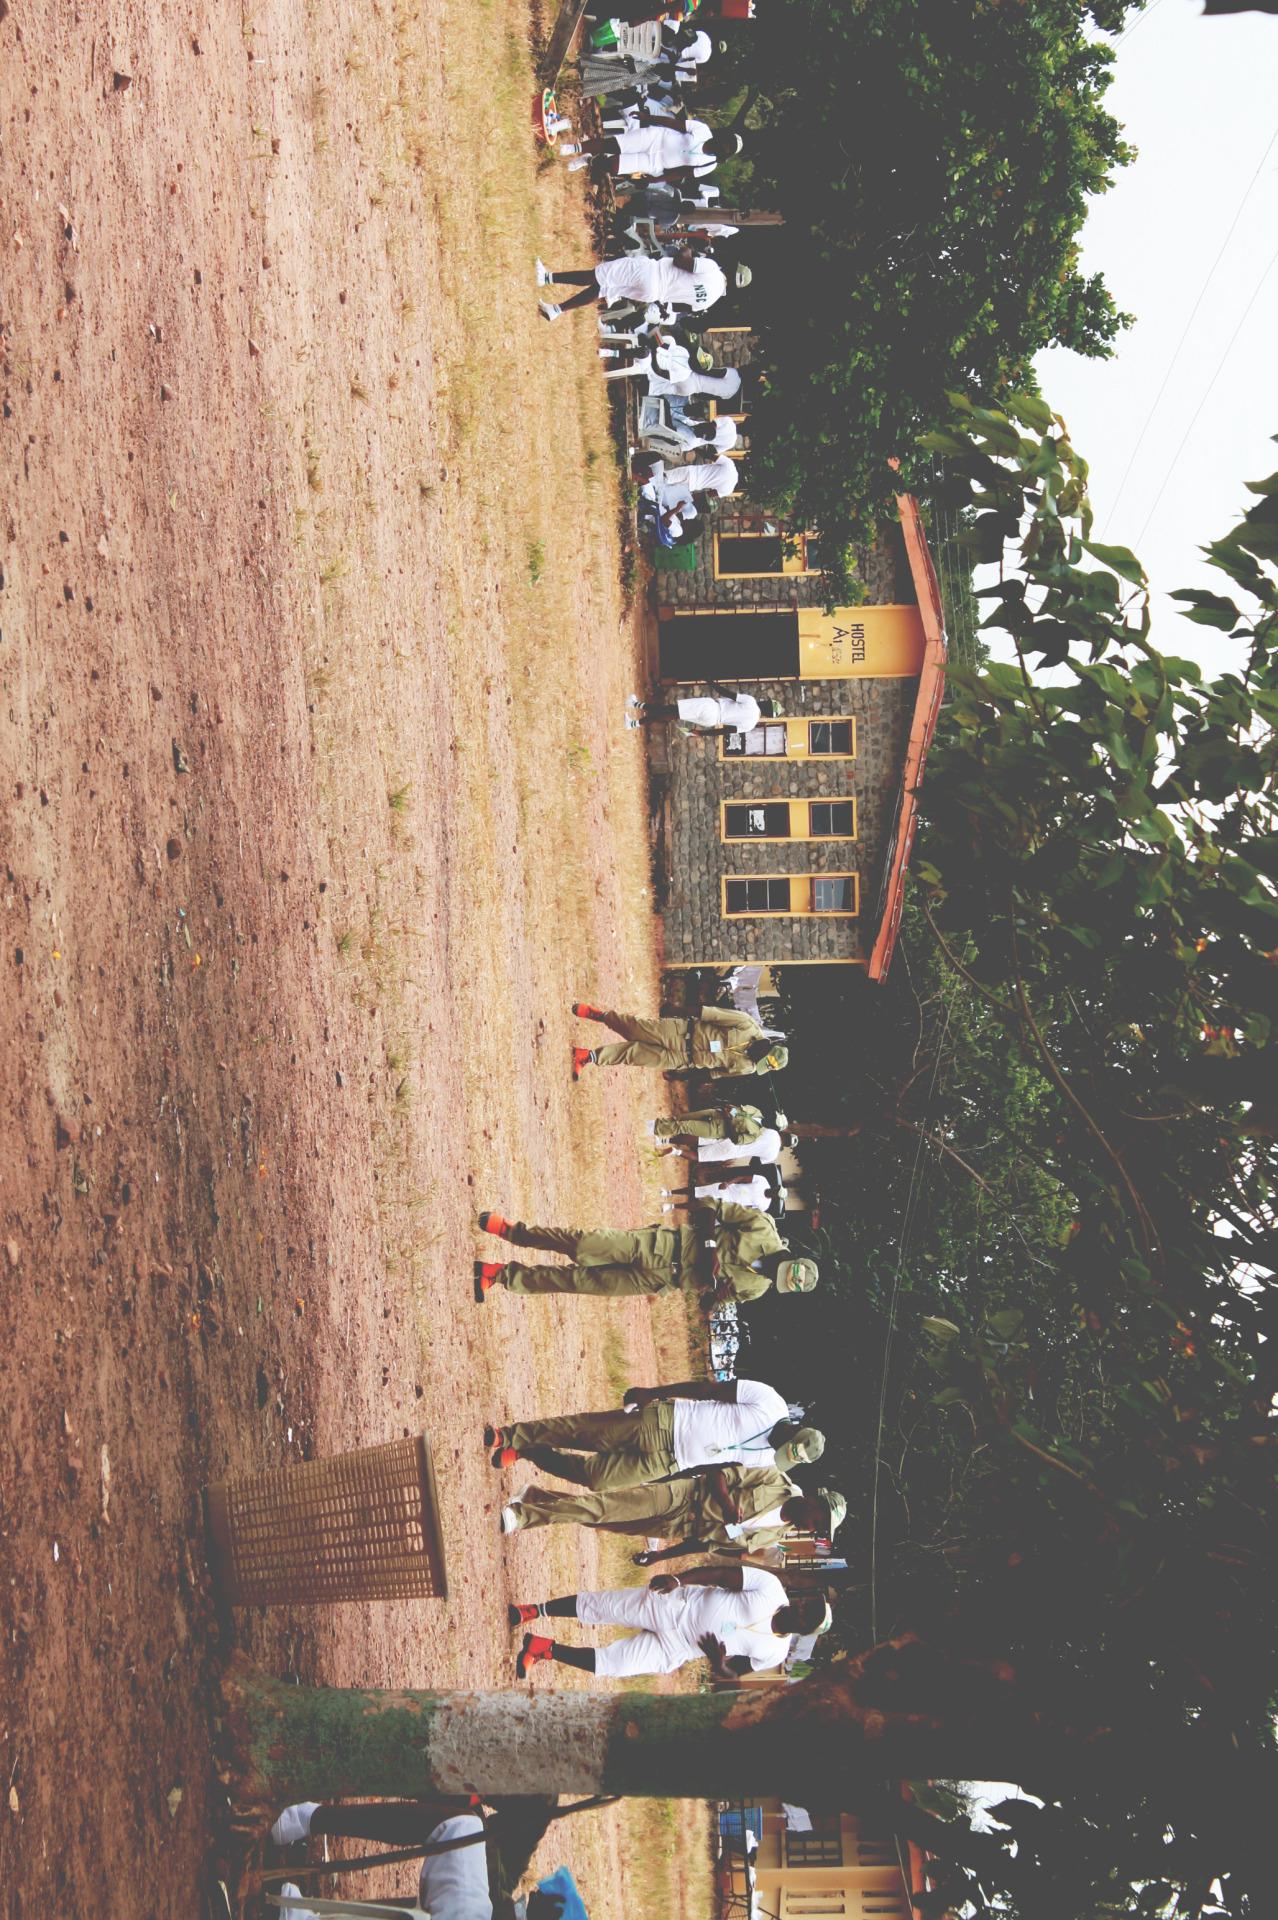 NYSC Orientation Camp, Kogi State, Nigeria